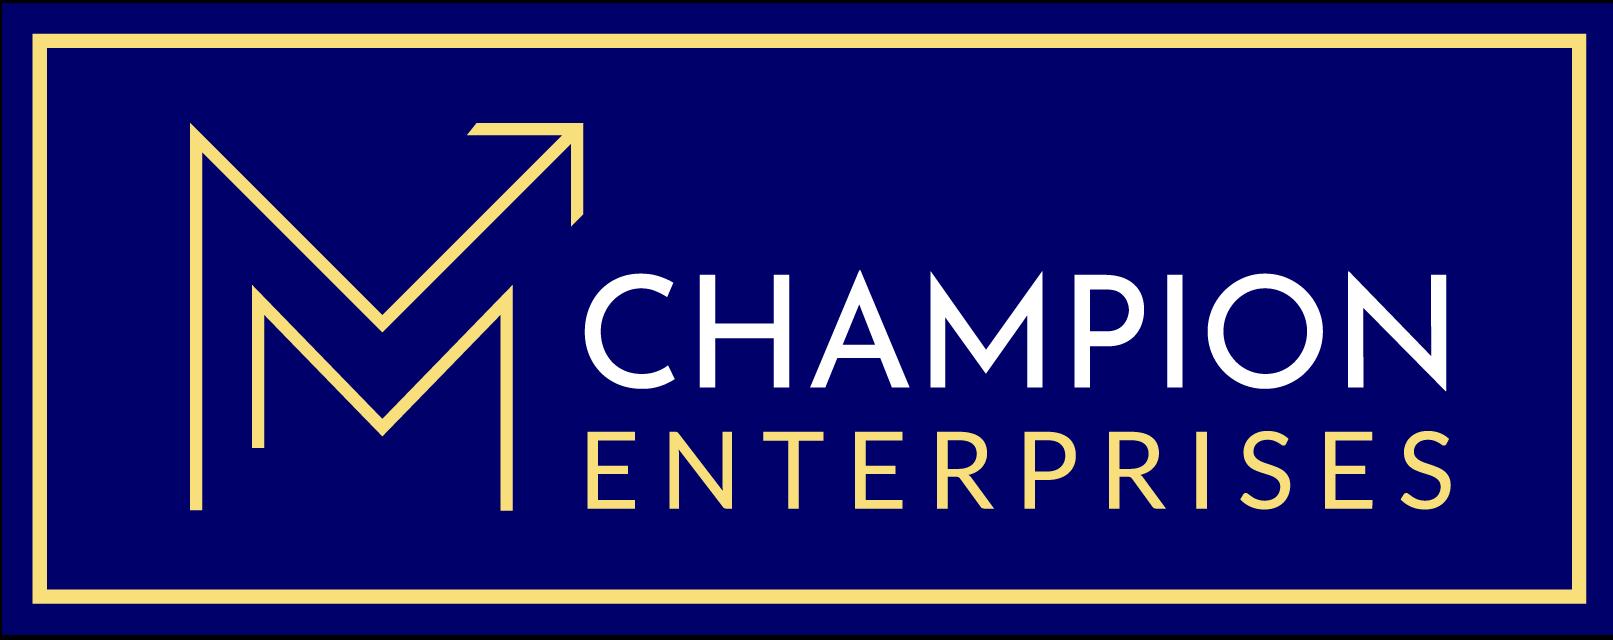 Mchampion Enterprises